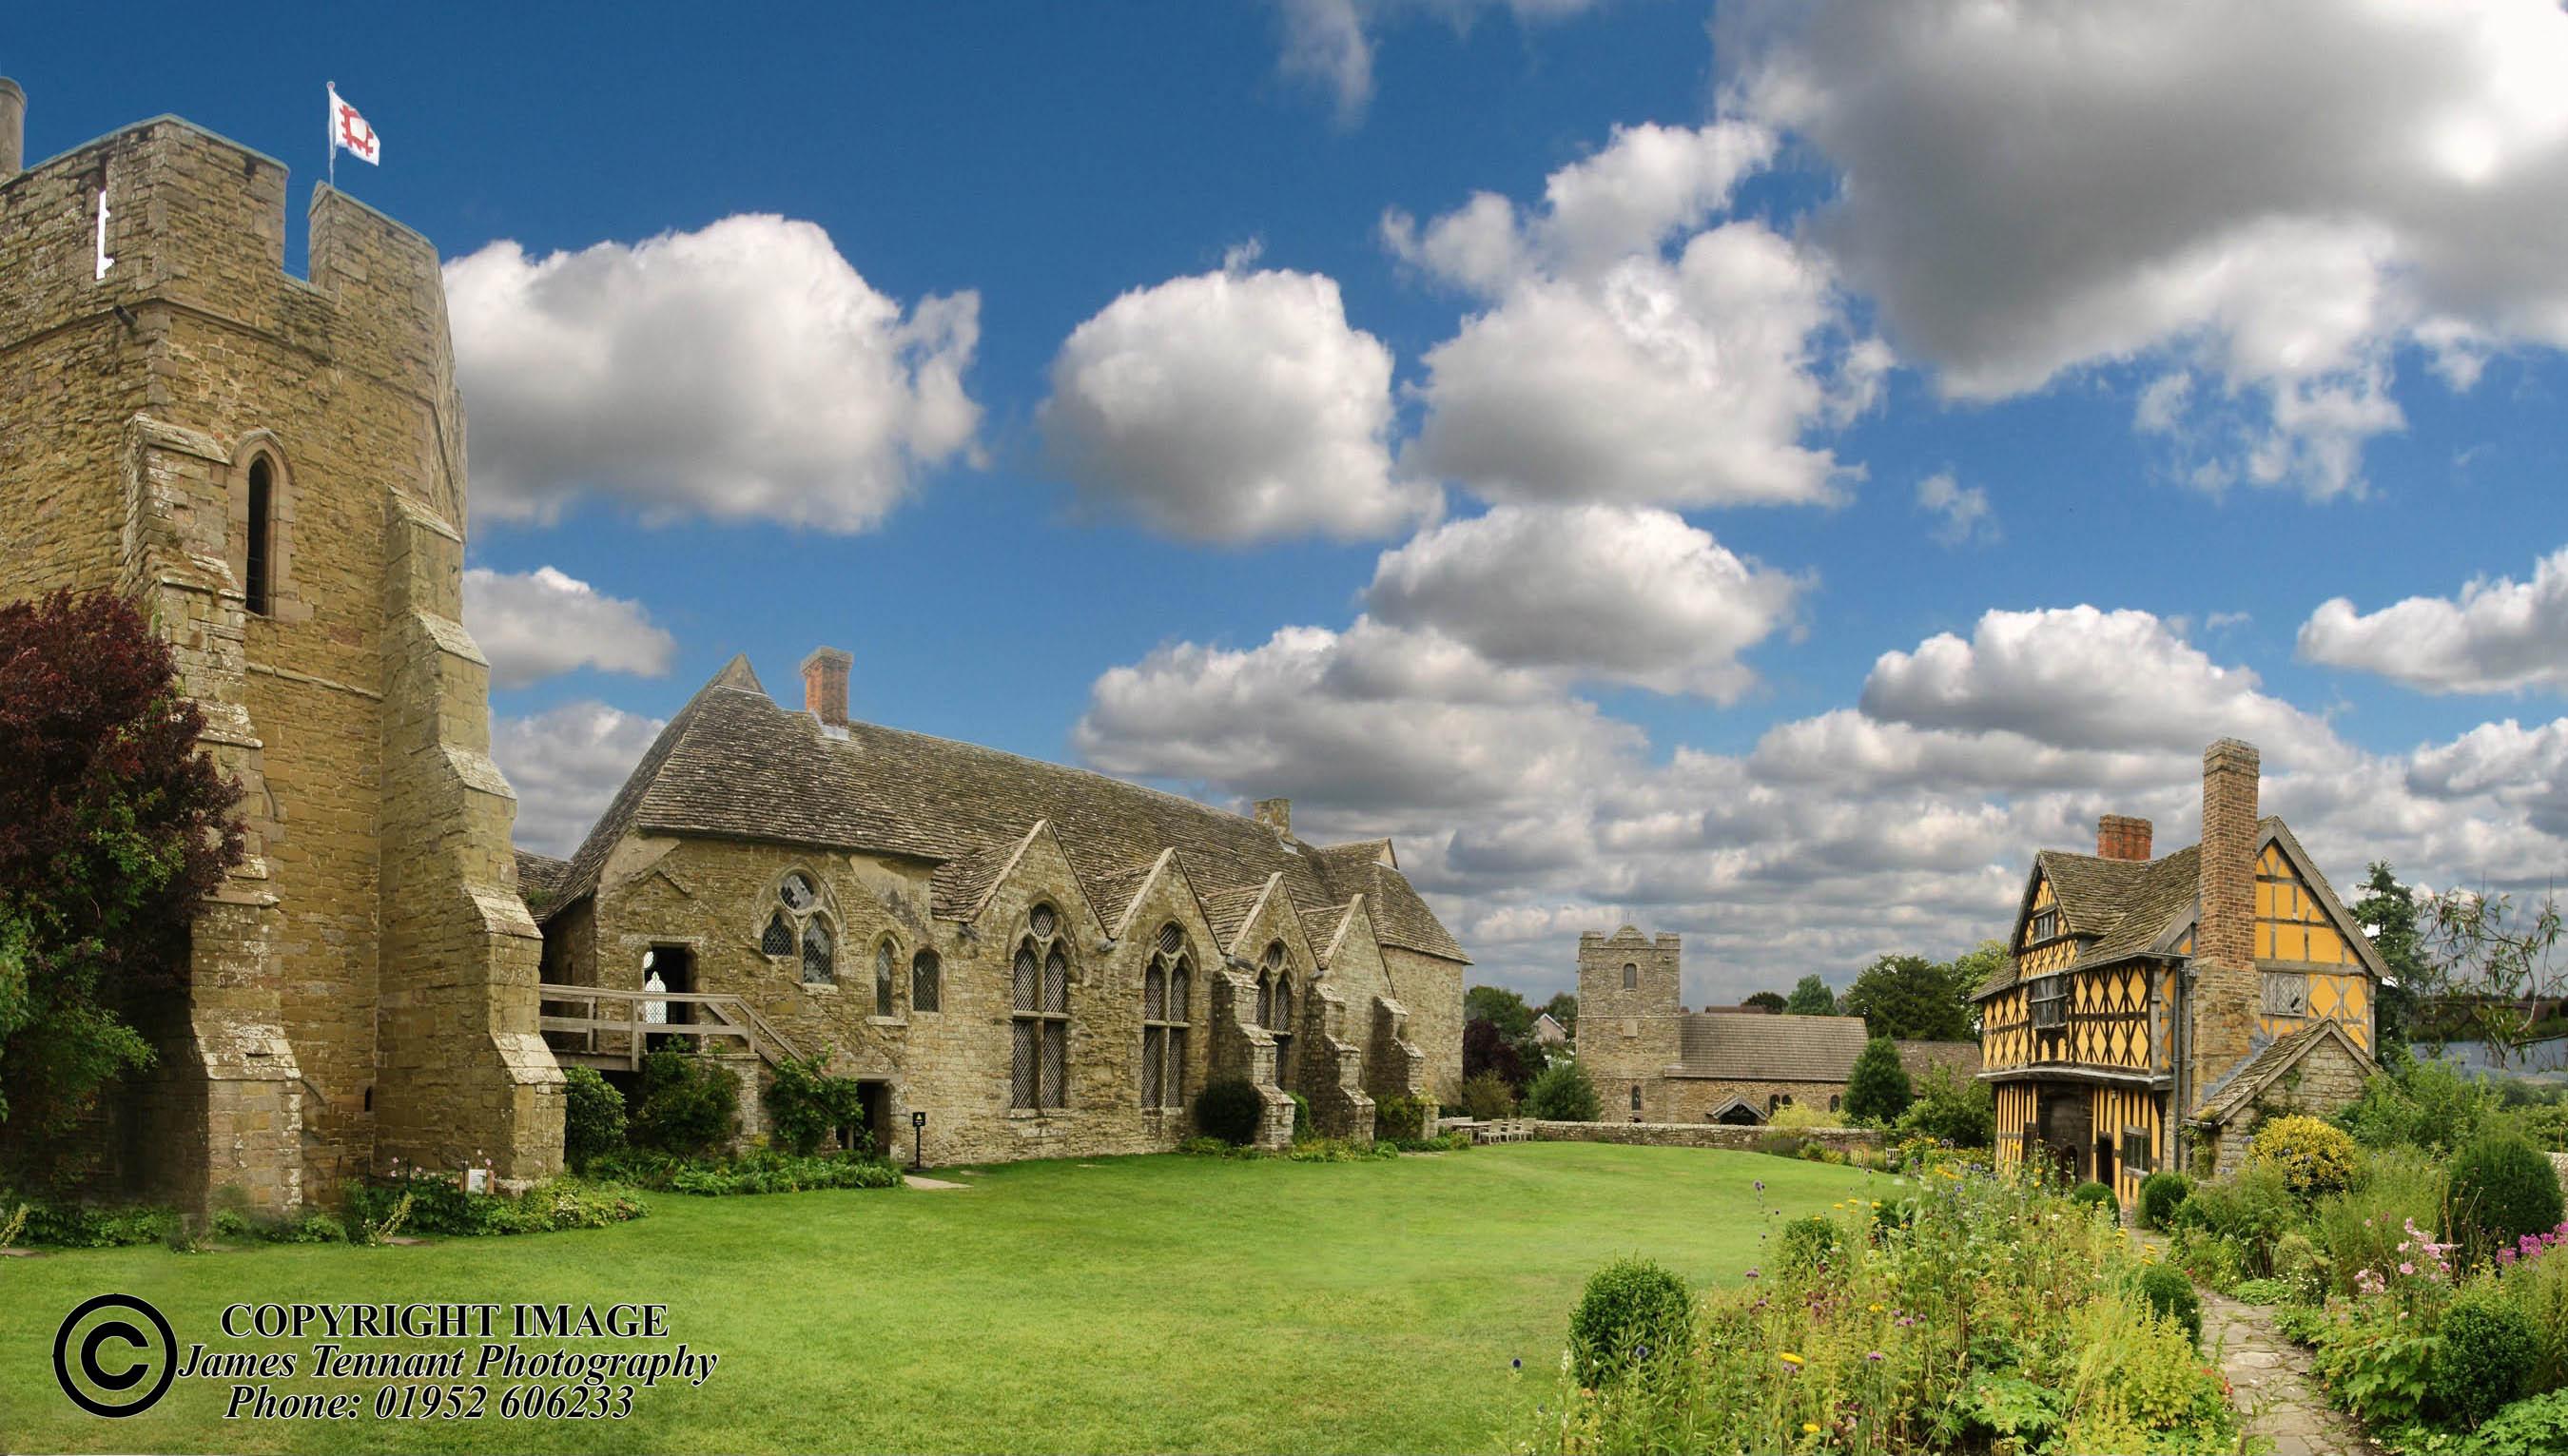 Stoksey Castle-001.jpg